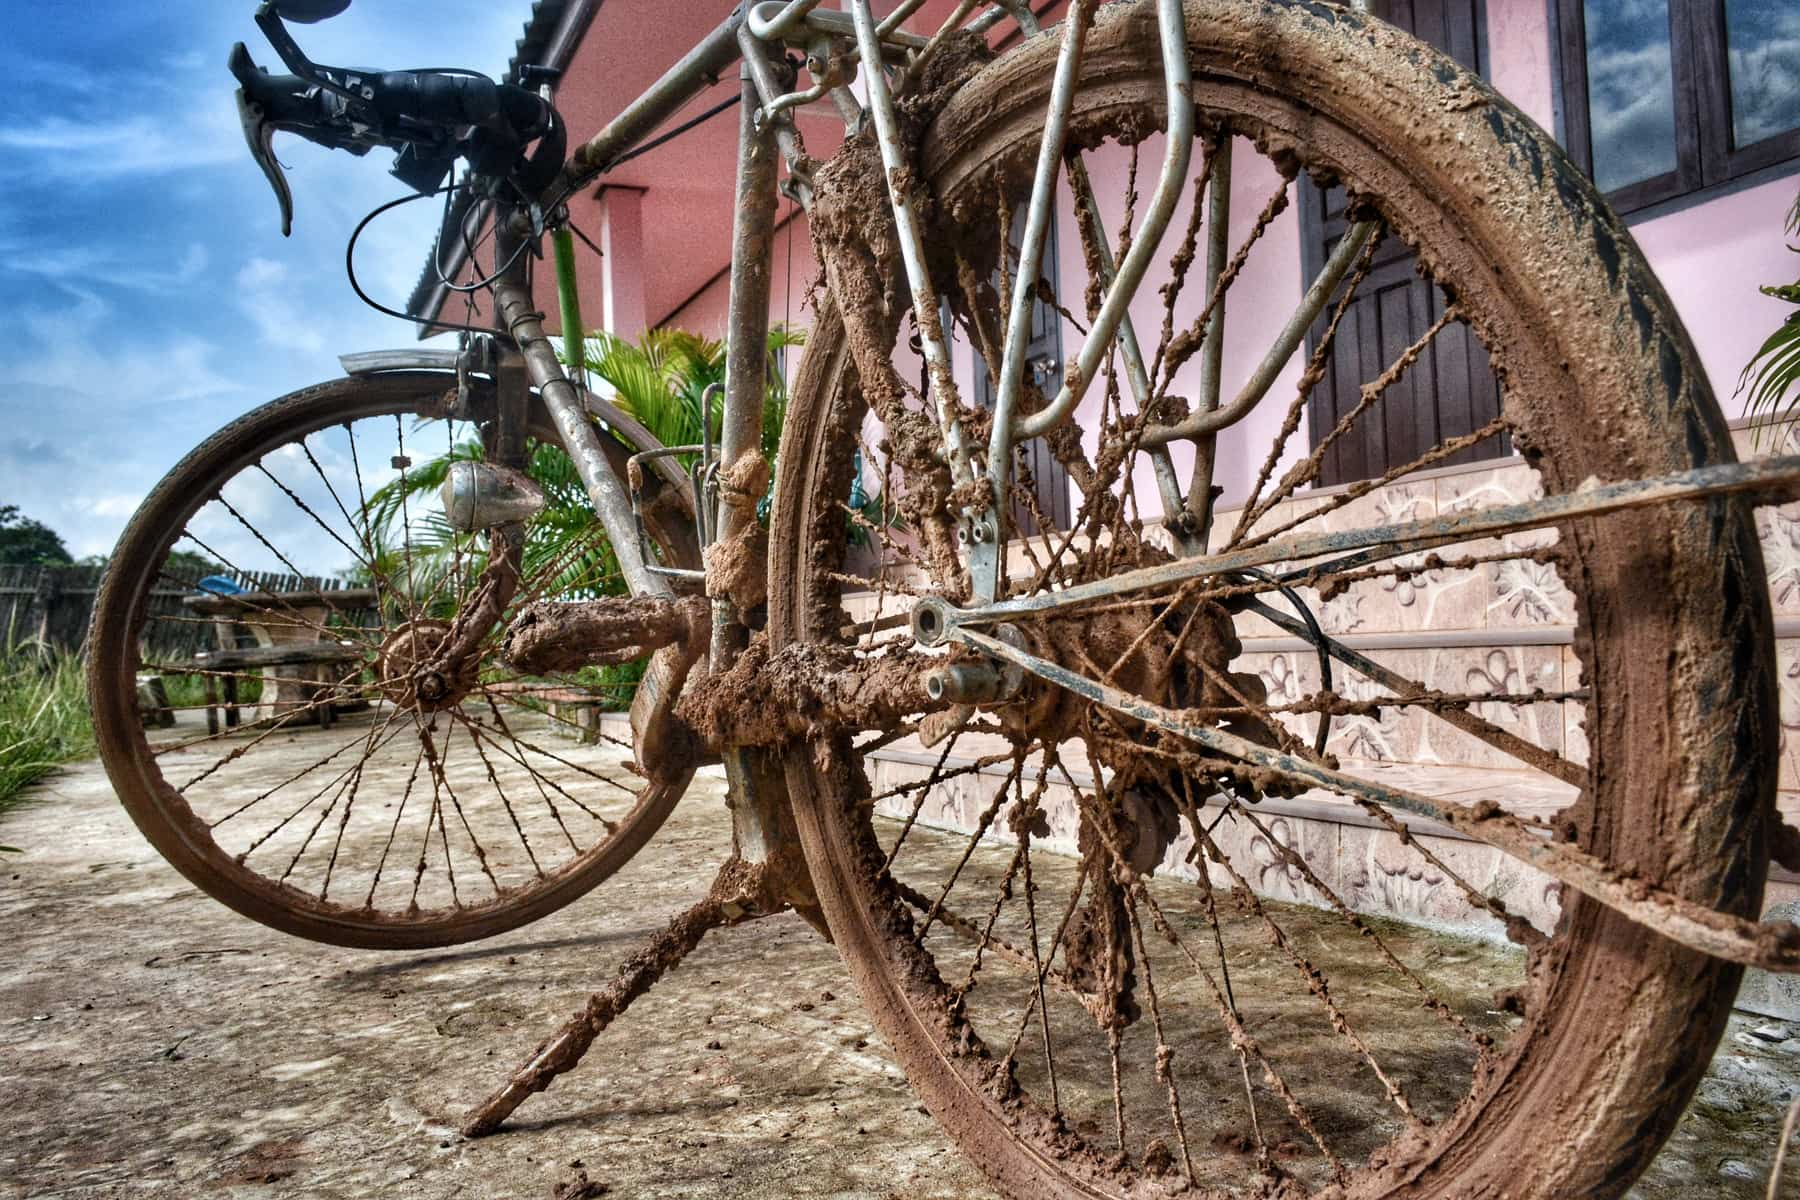 Cautand Bike Mtb Man